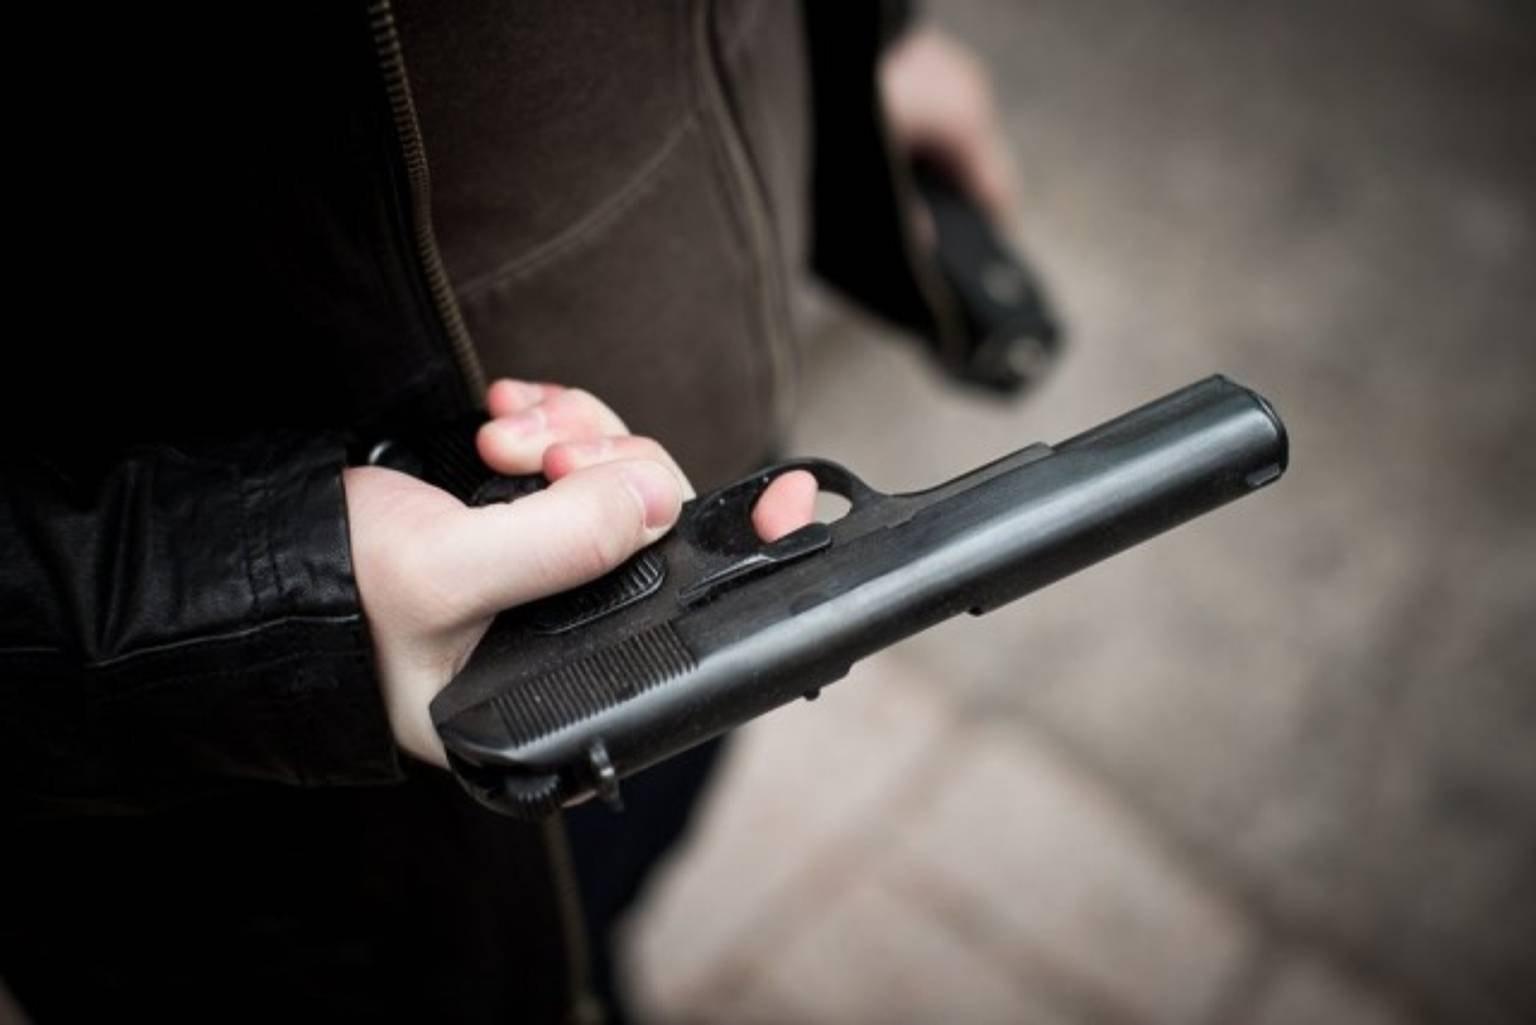 ВГреции преступник взял взаложники работницу супермаркета